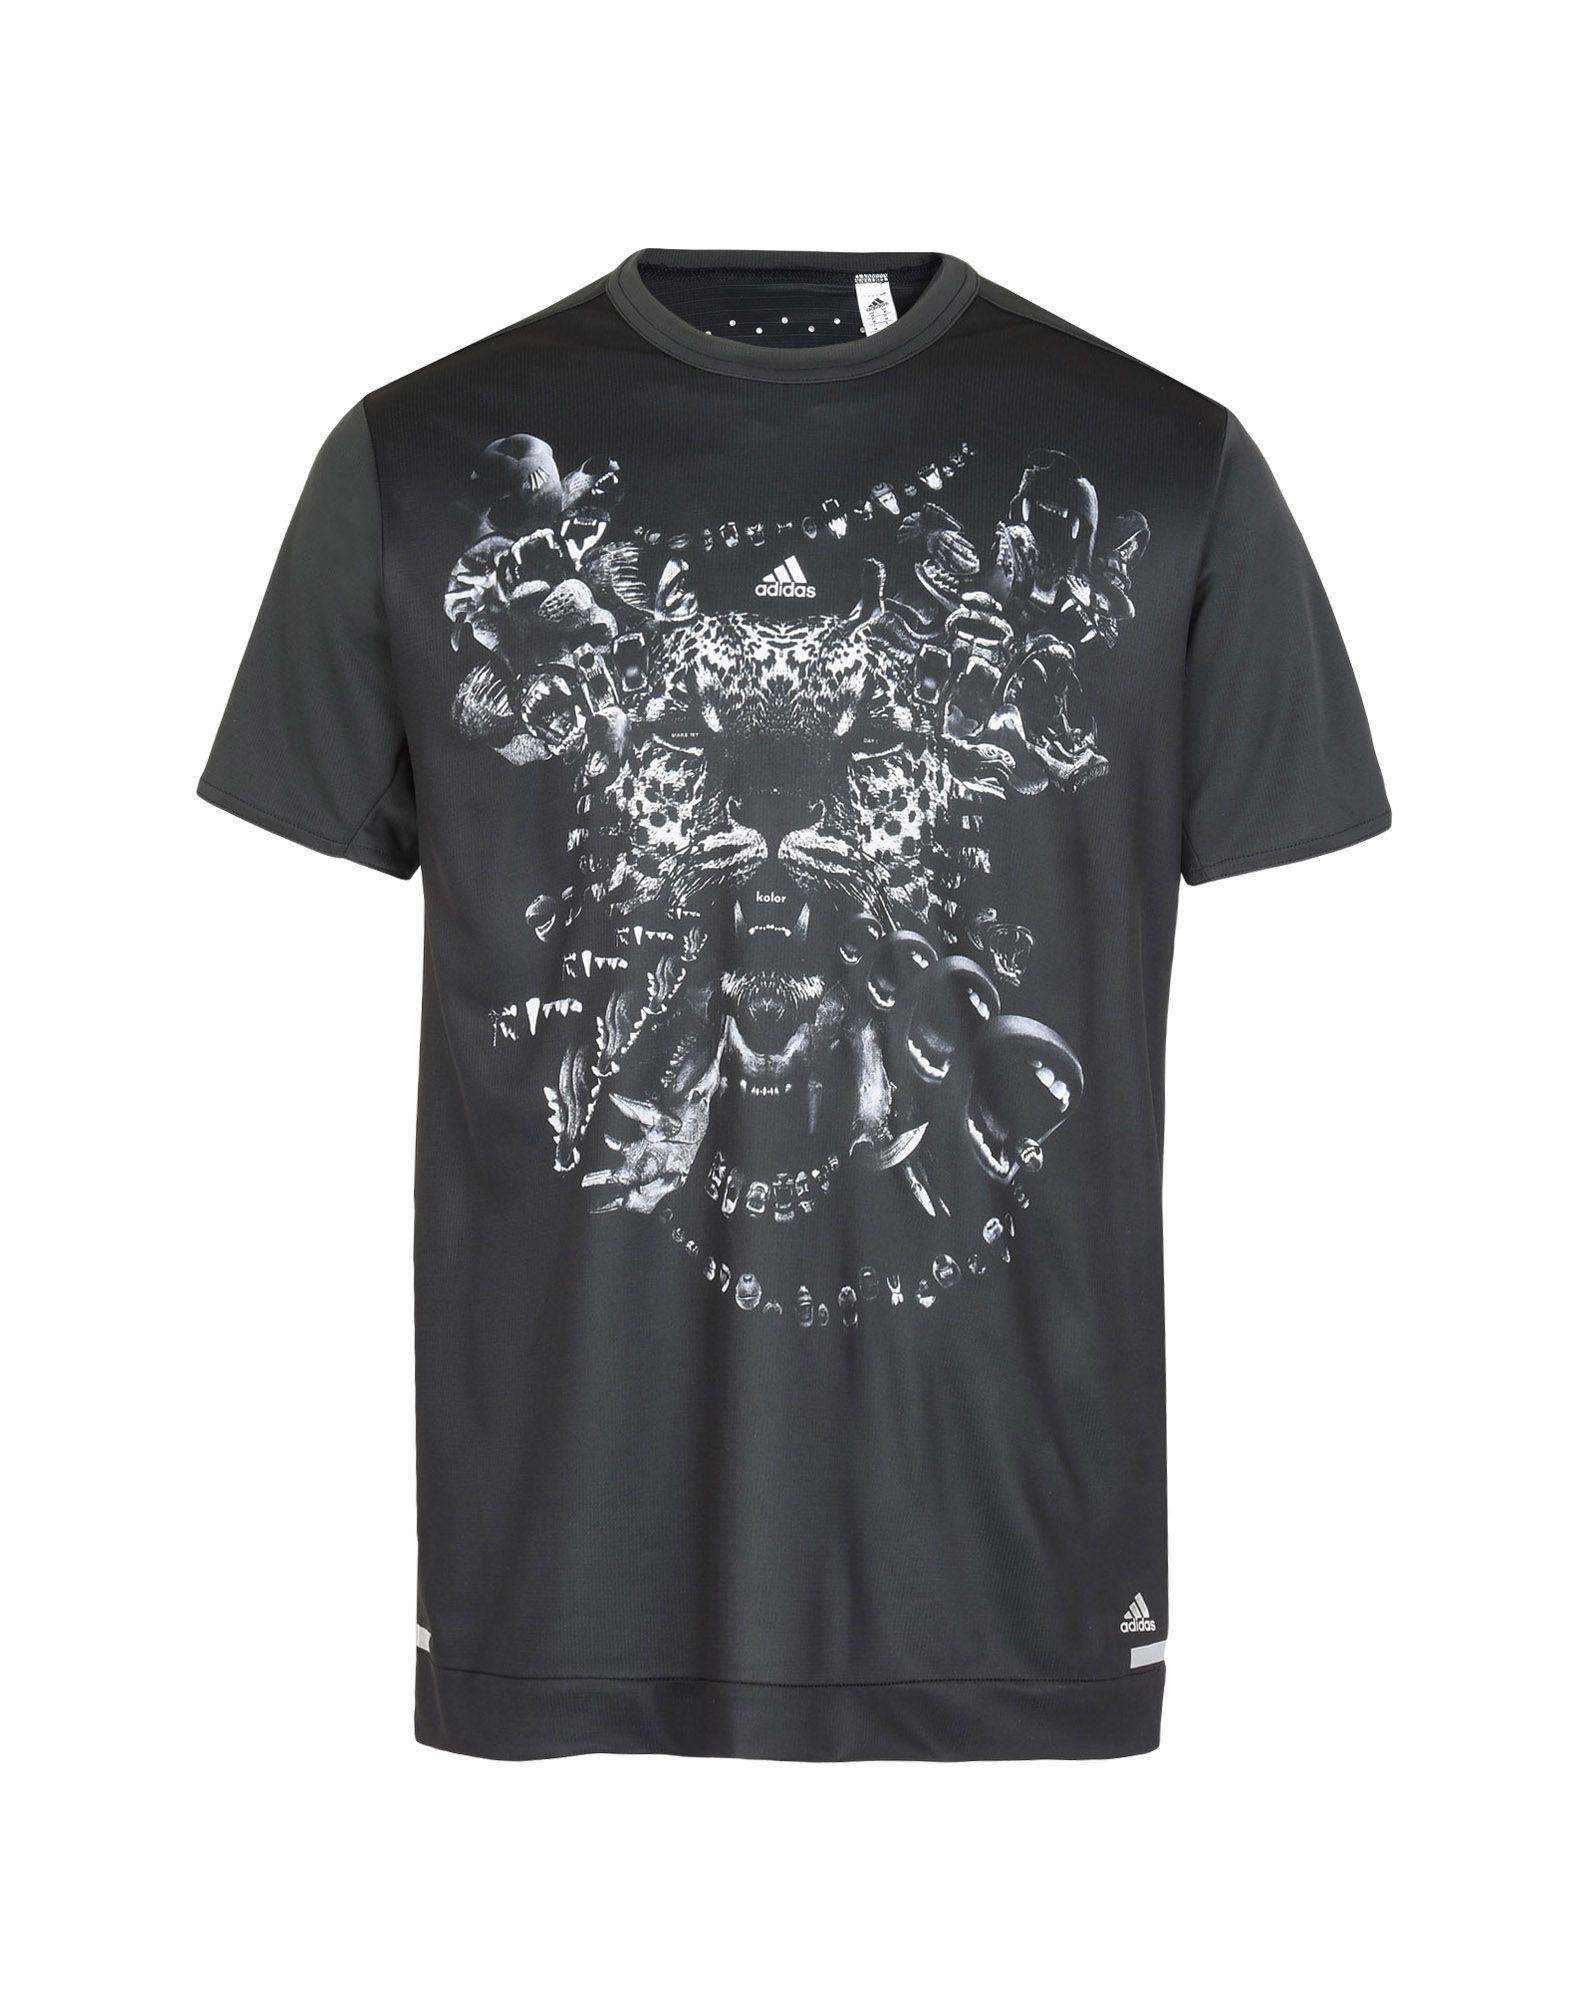 Black t shirt for man - Kolor Grapchic Tee 1 Tees Polos Man Y 3 Adidas